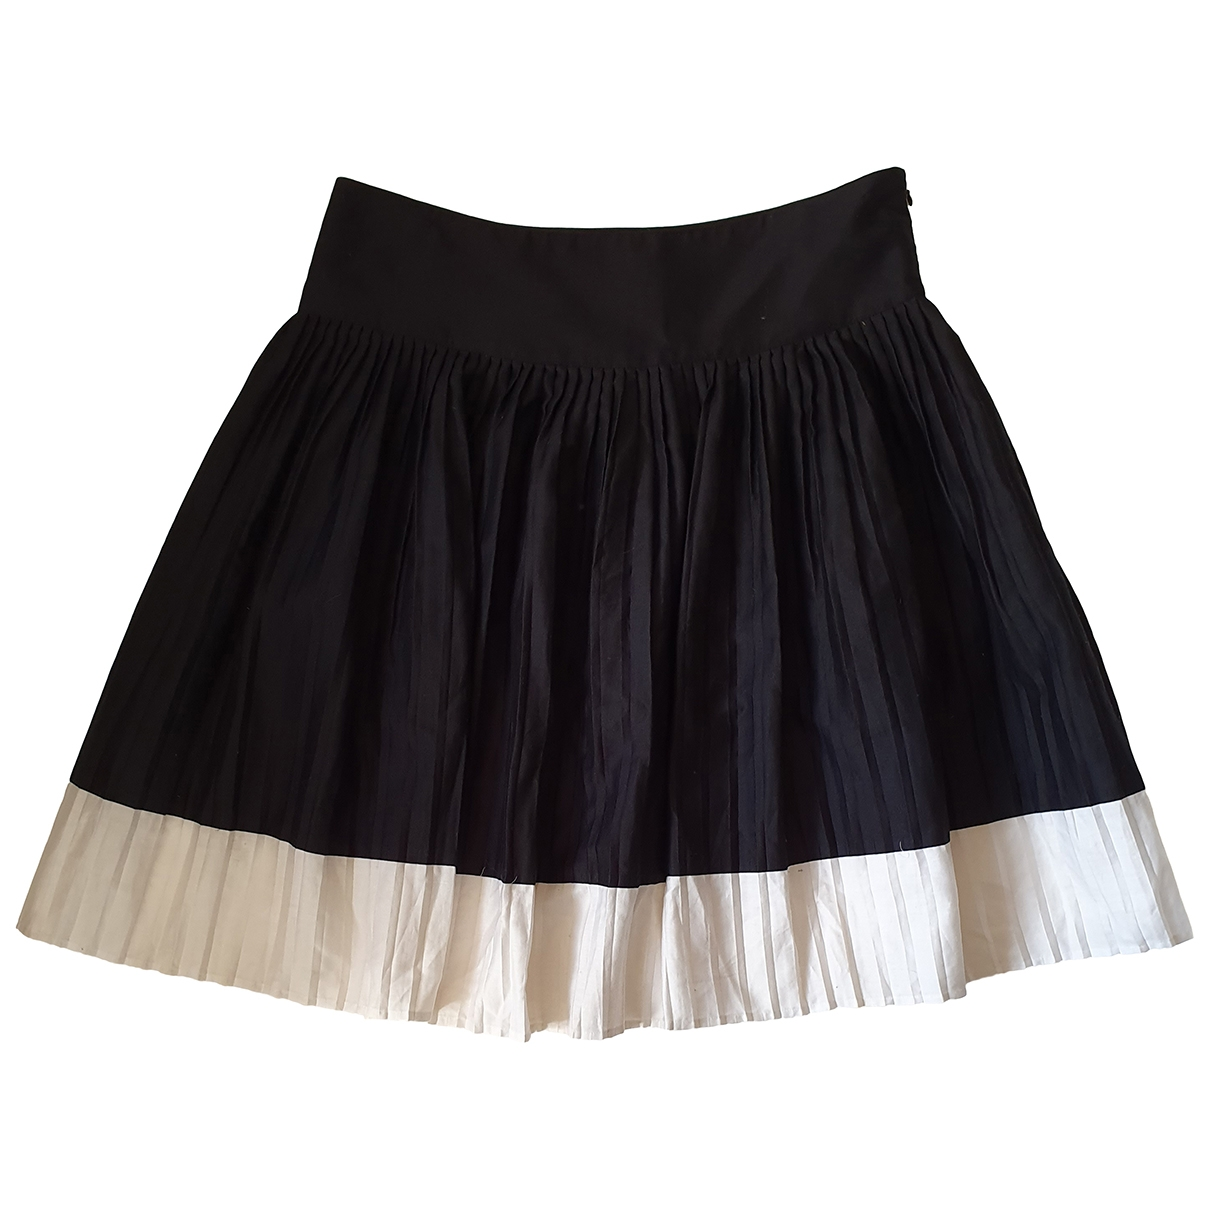 Lauren Ralph Lauren \N Black Cotton skirt for Women L International